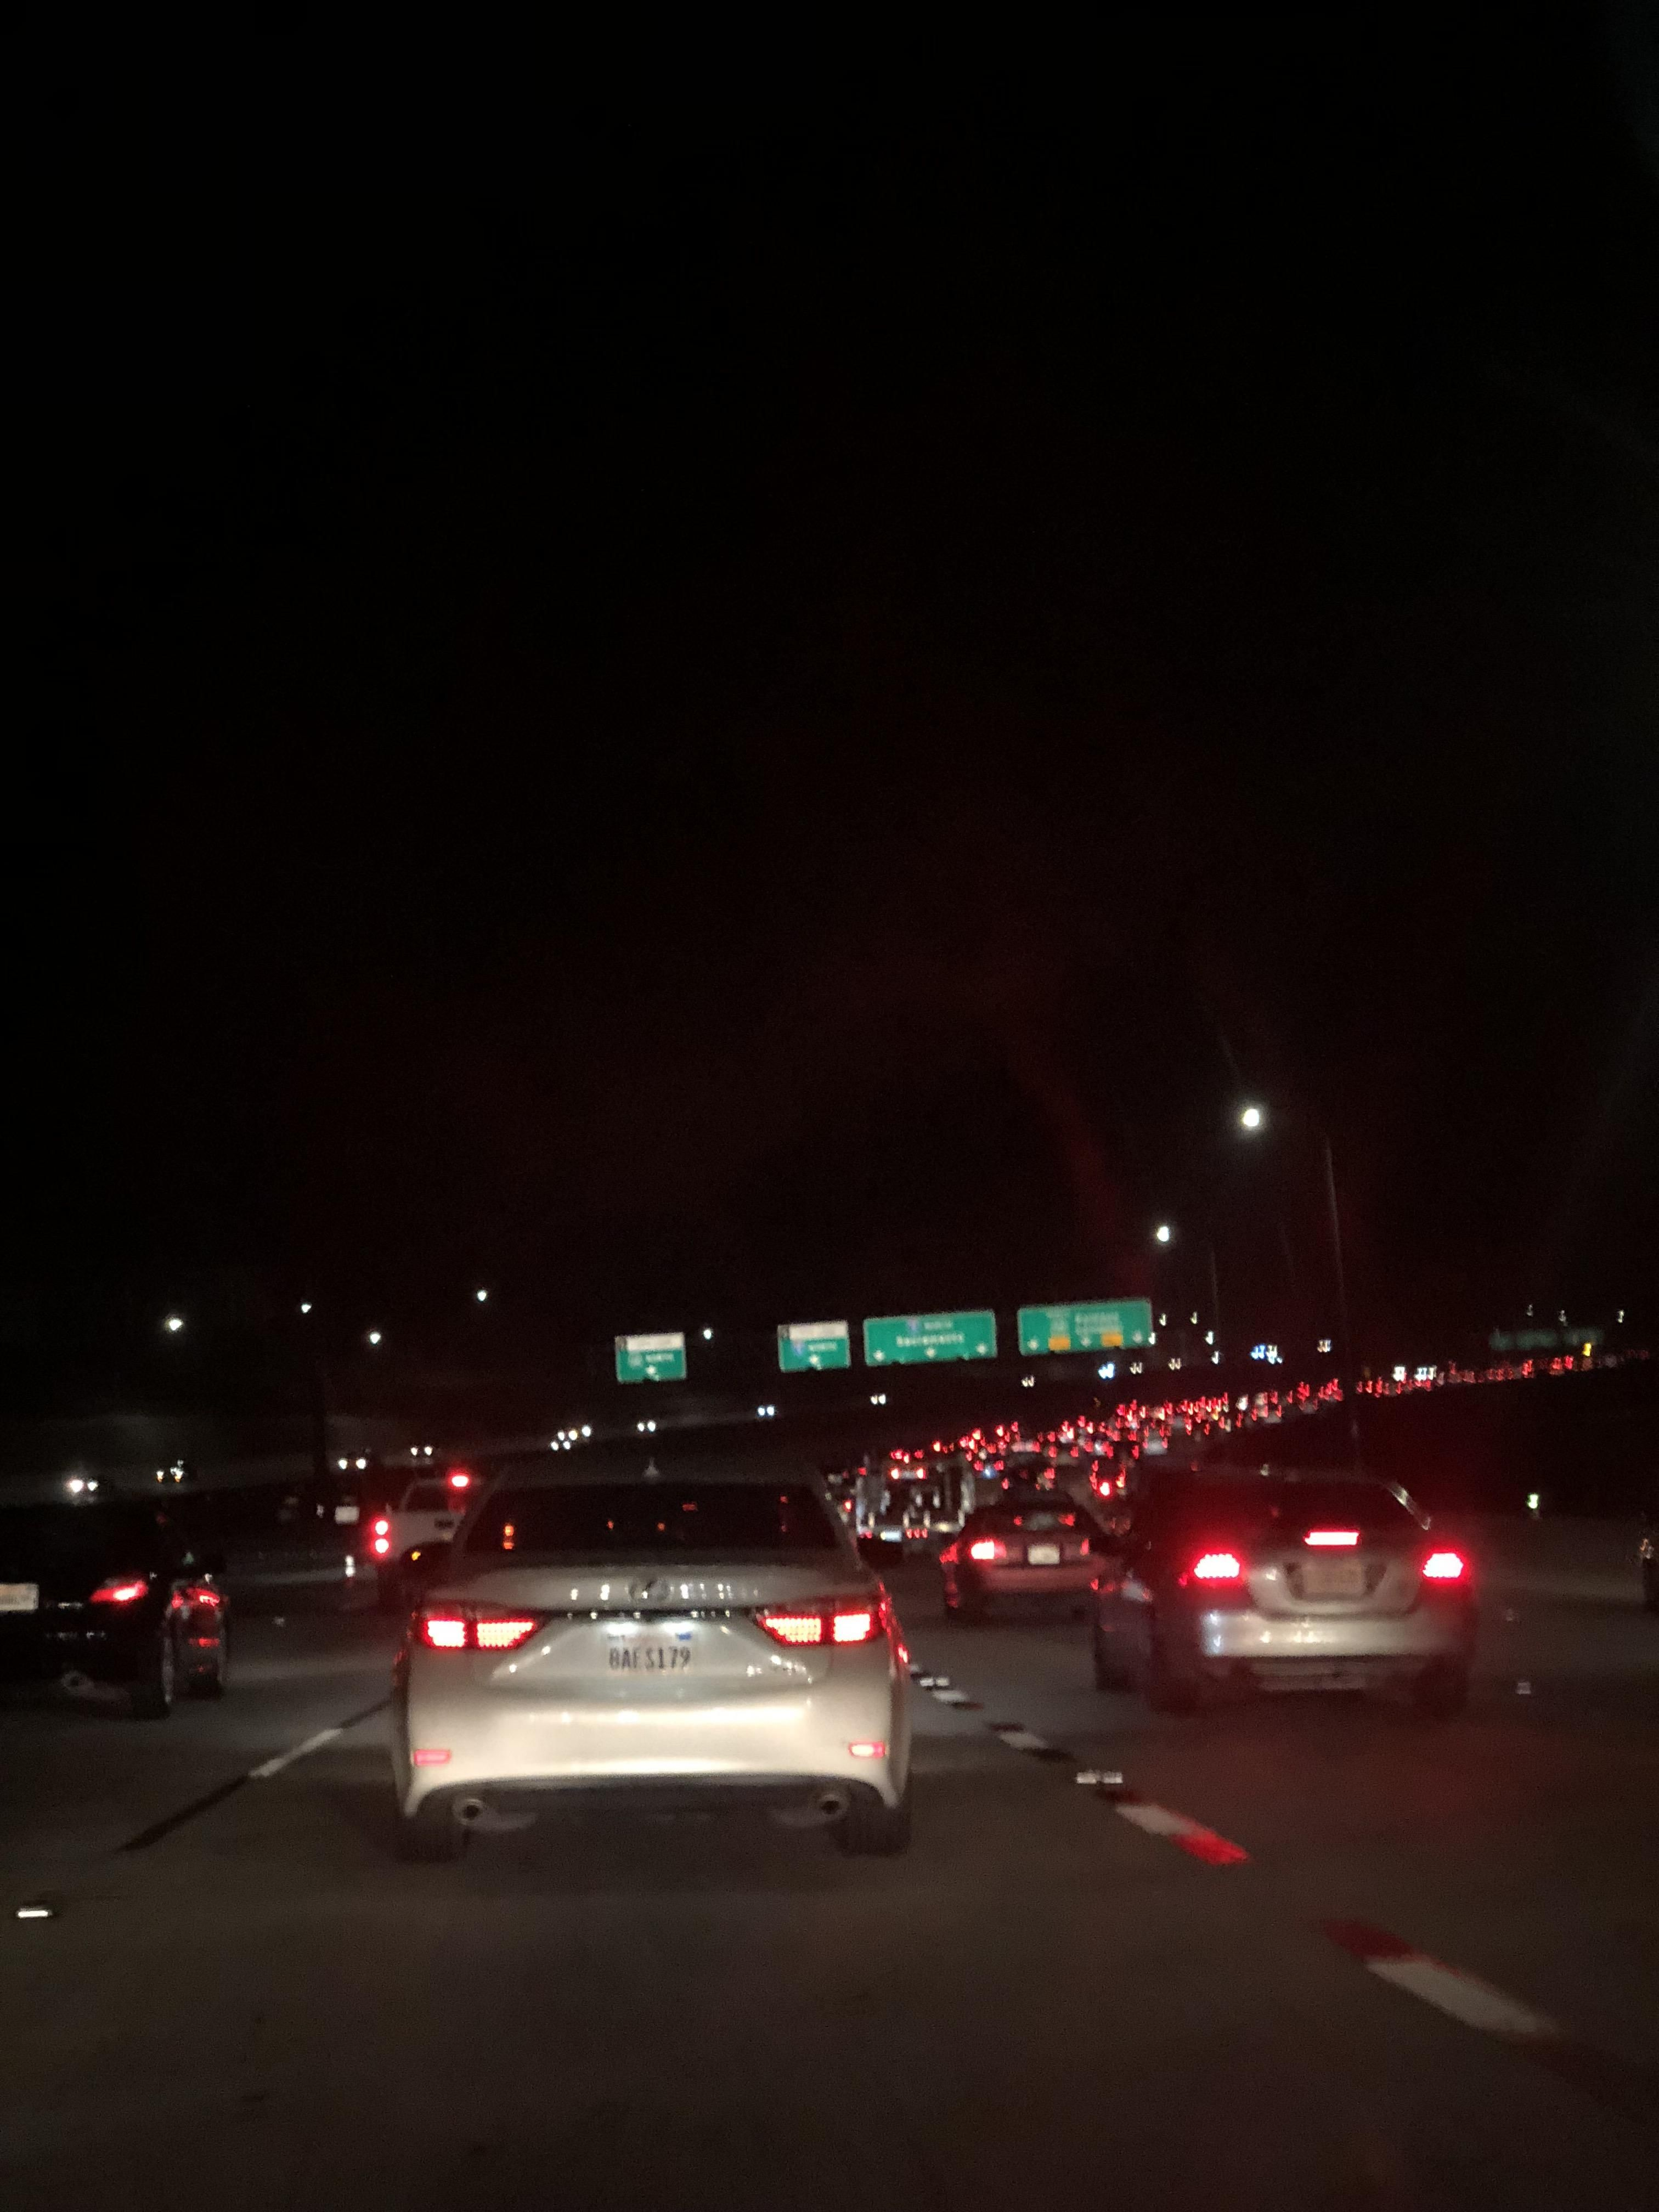 Late Night Traffic On The 5 North Near Santa Clarita Please Bring Food Truck Thanks Night Night Vibes Late Night Drives